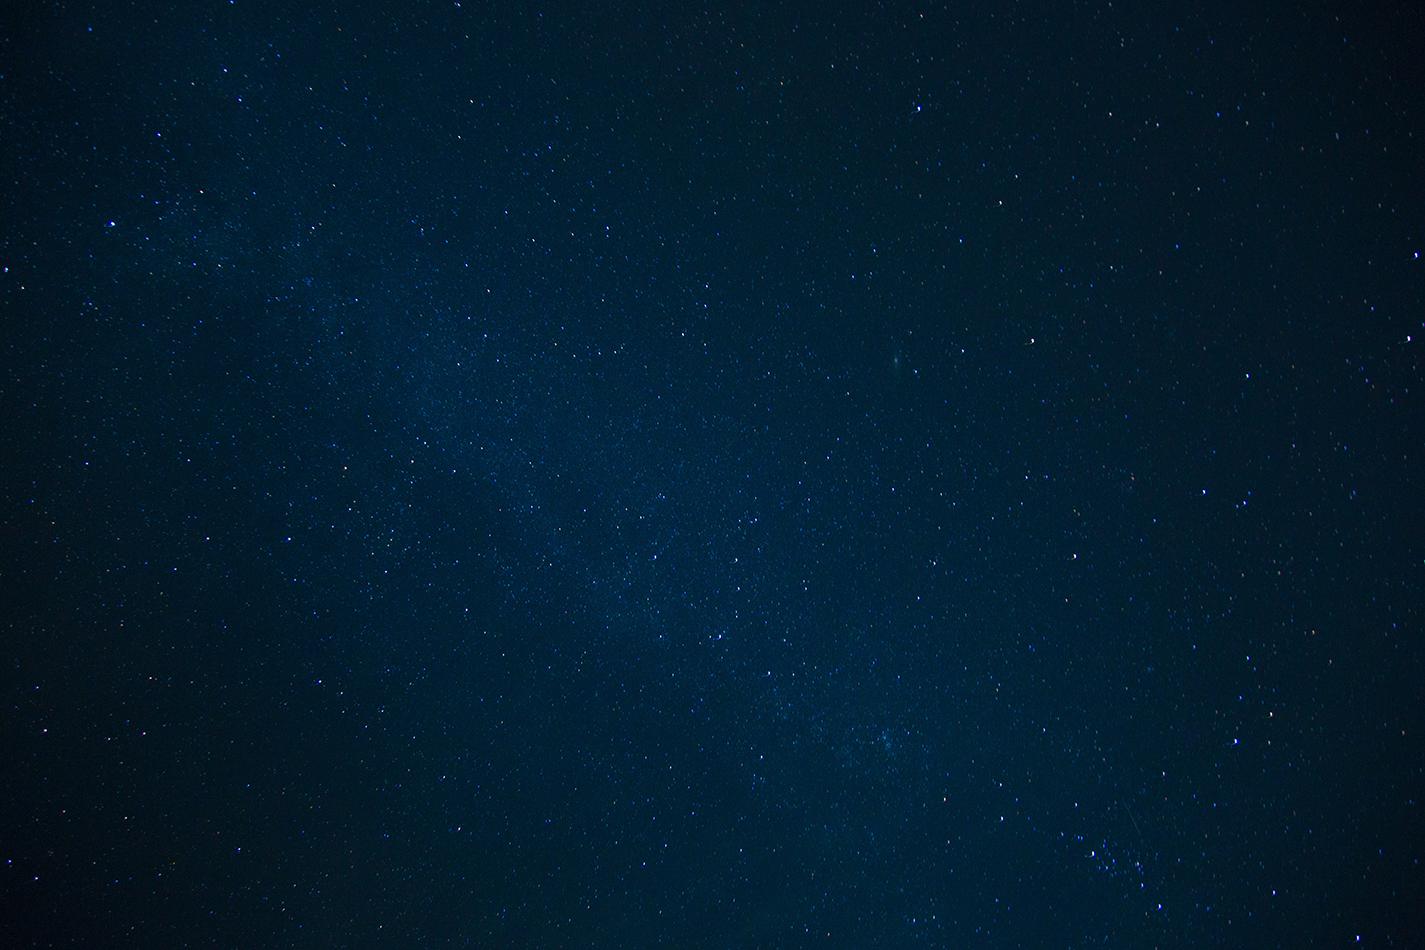 ilnur-kalimullin-153166-unsplash_StarTwirl_Before.jpg